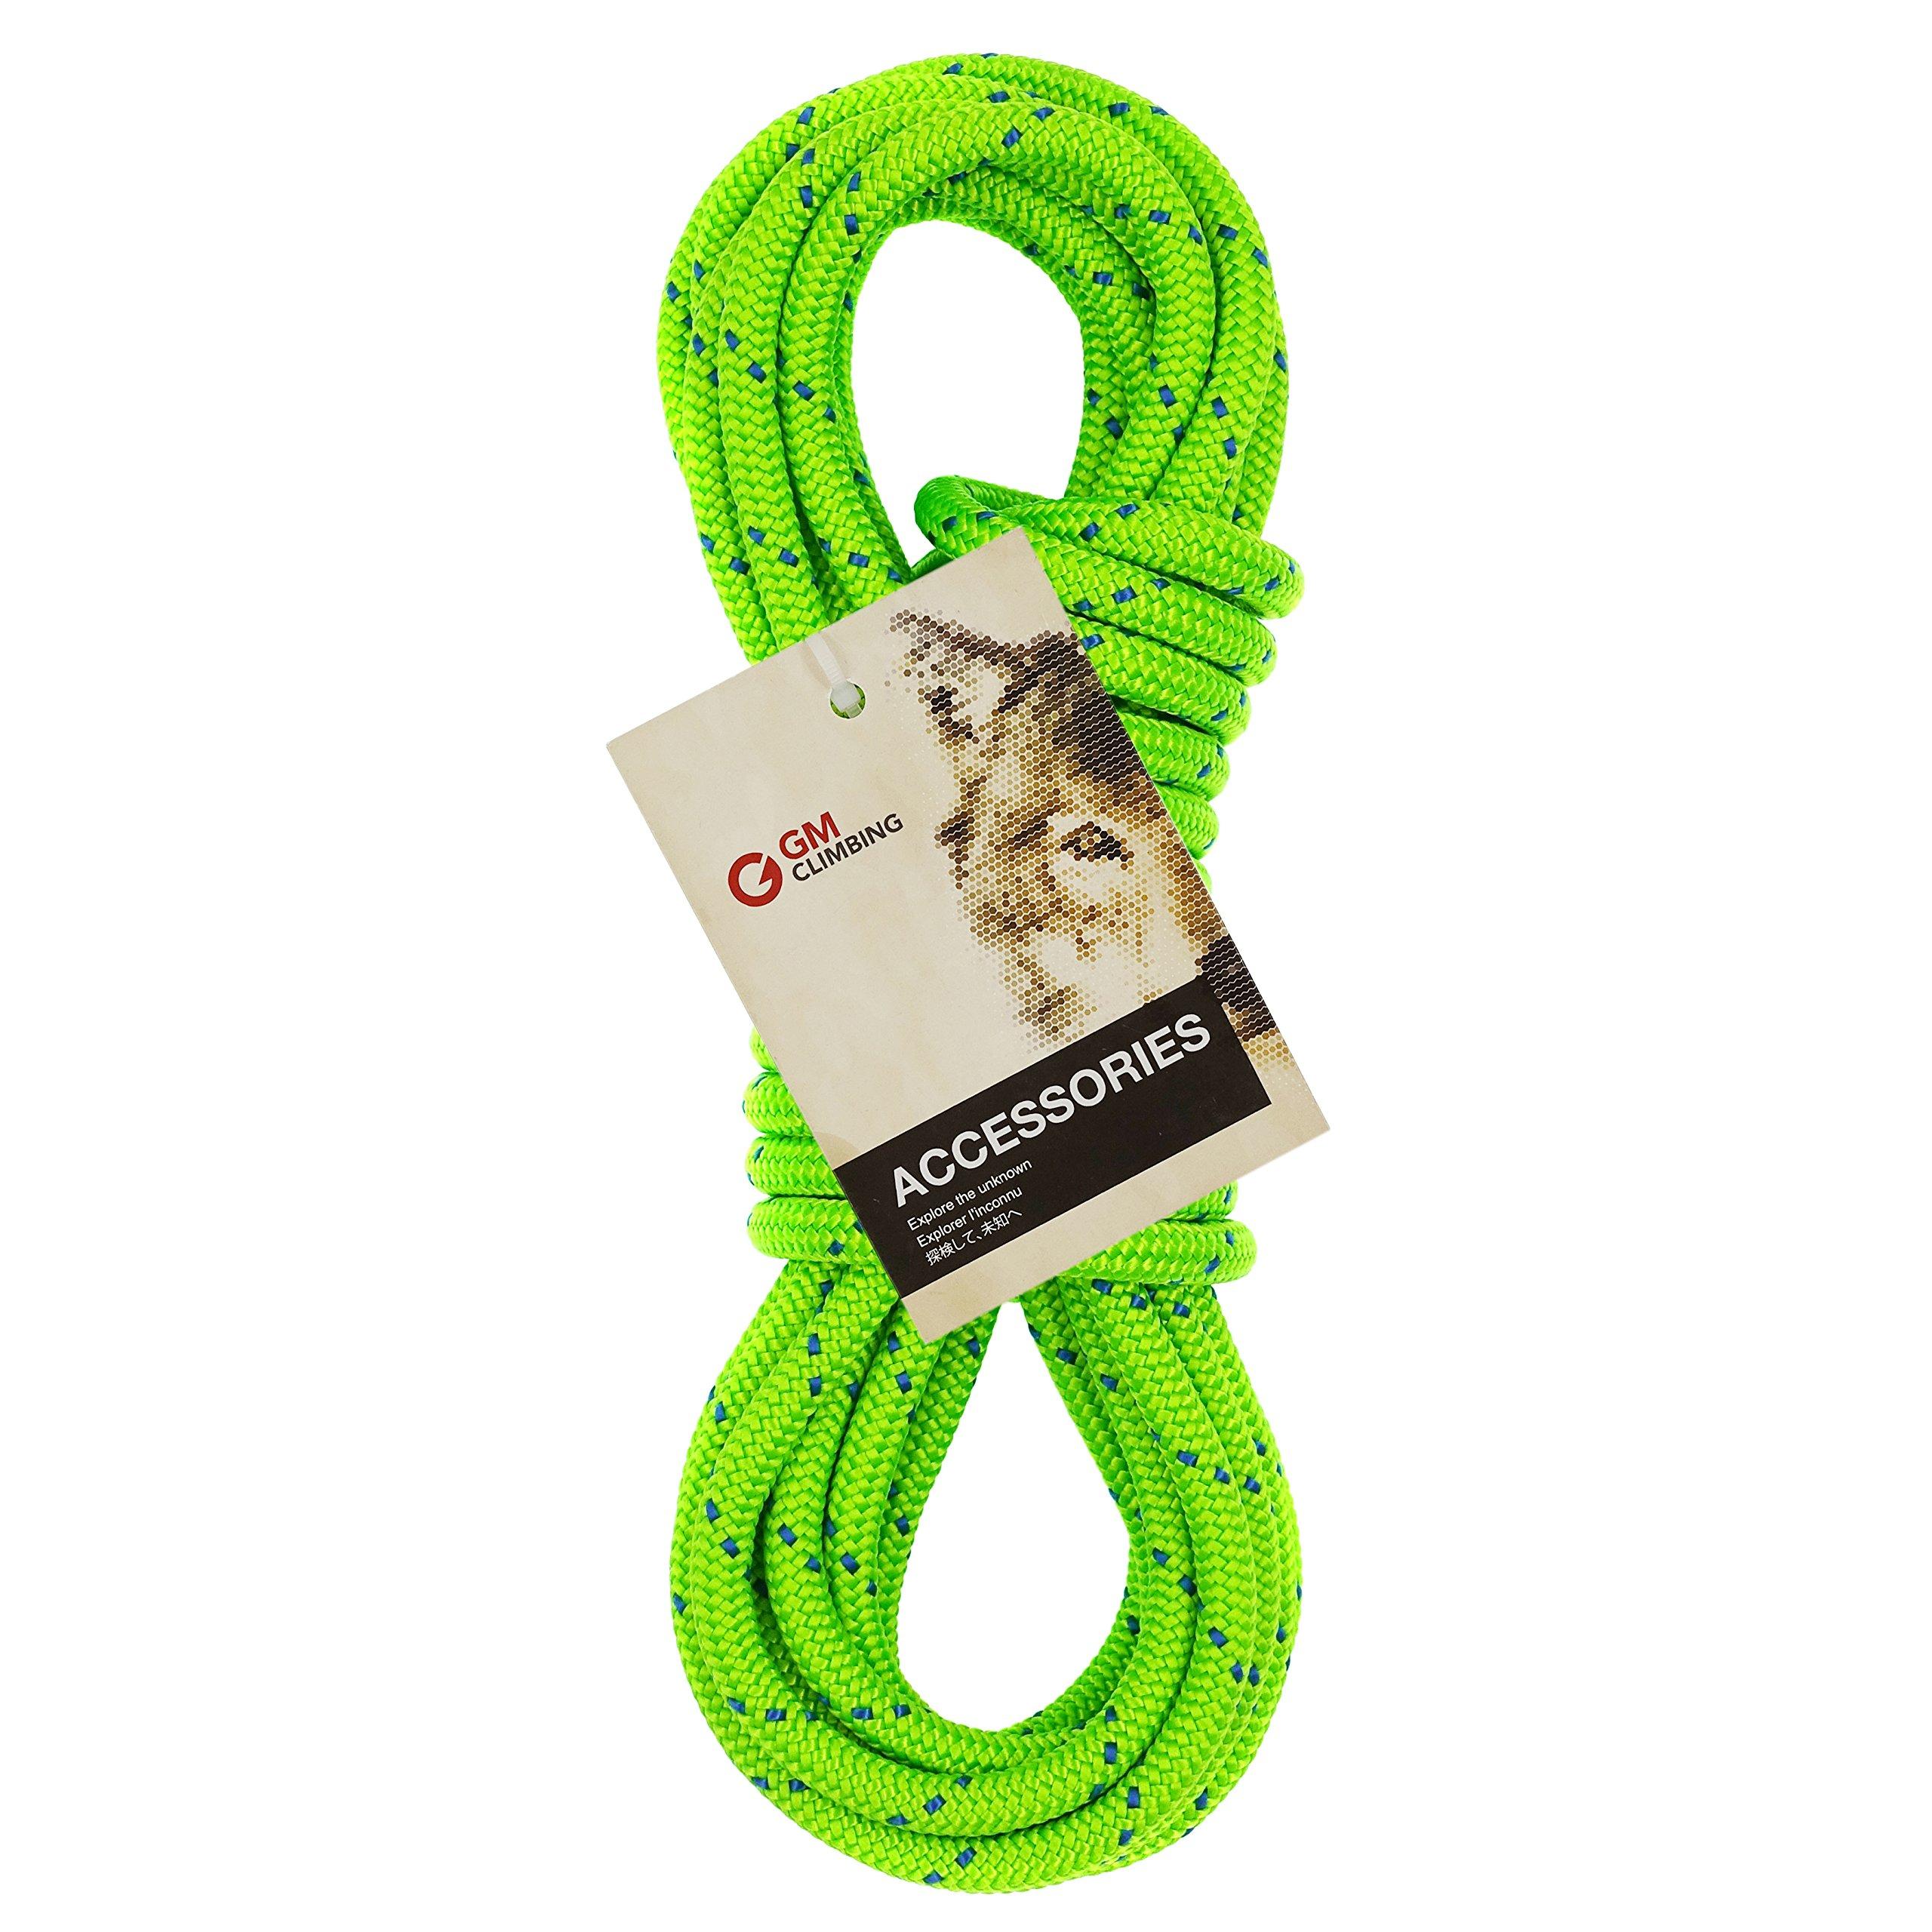 GM CLIMBING 6mm Accessory Cord Rope Double Braid Black Pre Cut CE (Green Flecks, 6mm 20ft) by GM CLIMBING